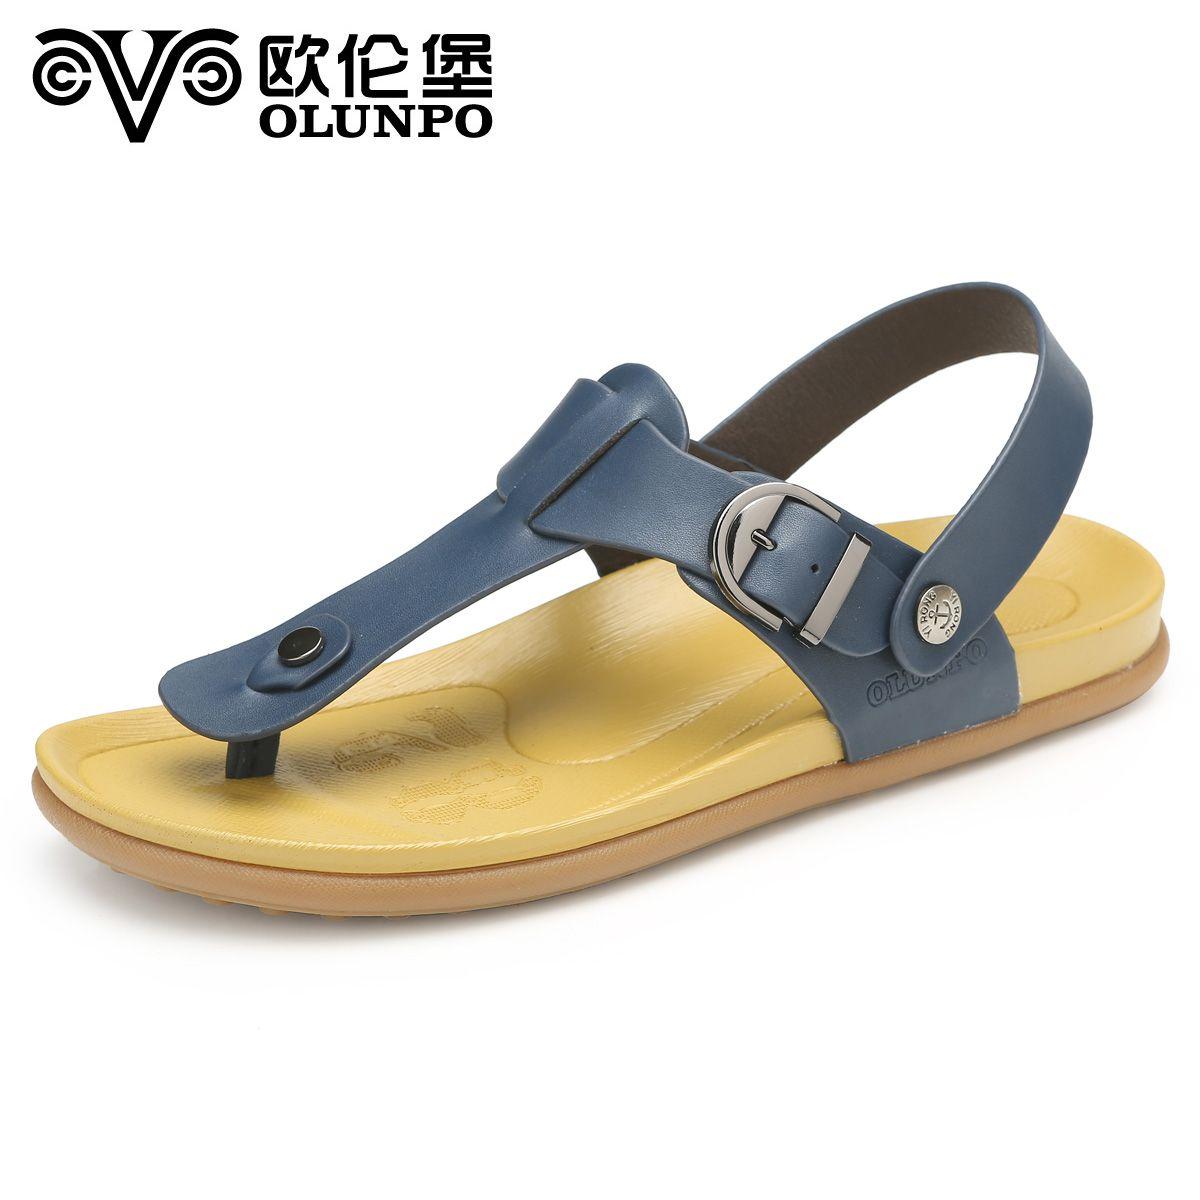 European sandals shoes - European Fort Beach Shoes Men Korean Men S Casual Leather Sandals Sandals Trend Summer 2014 New Xyr1405